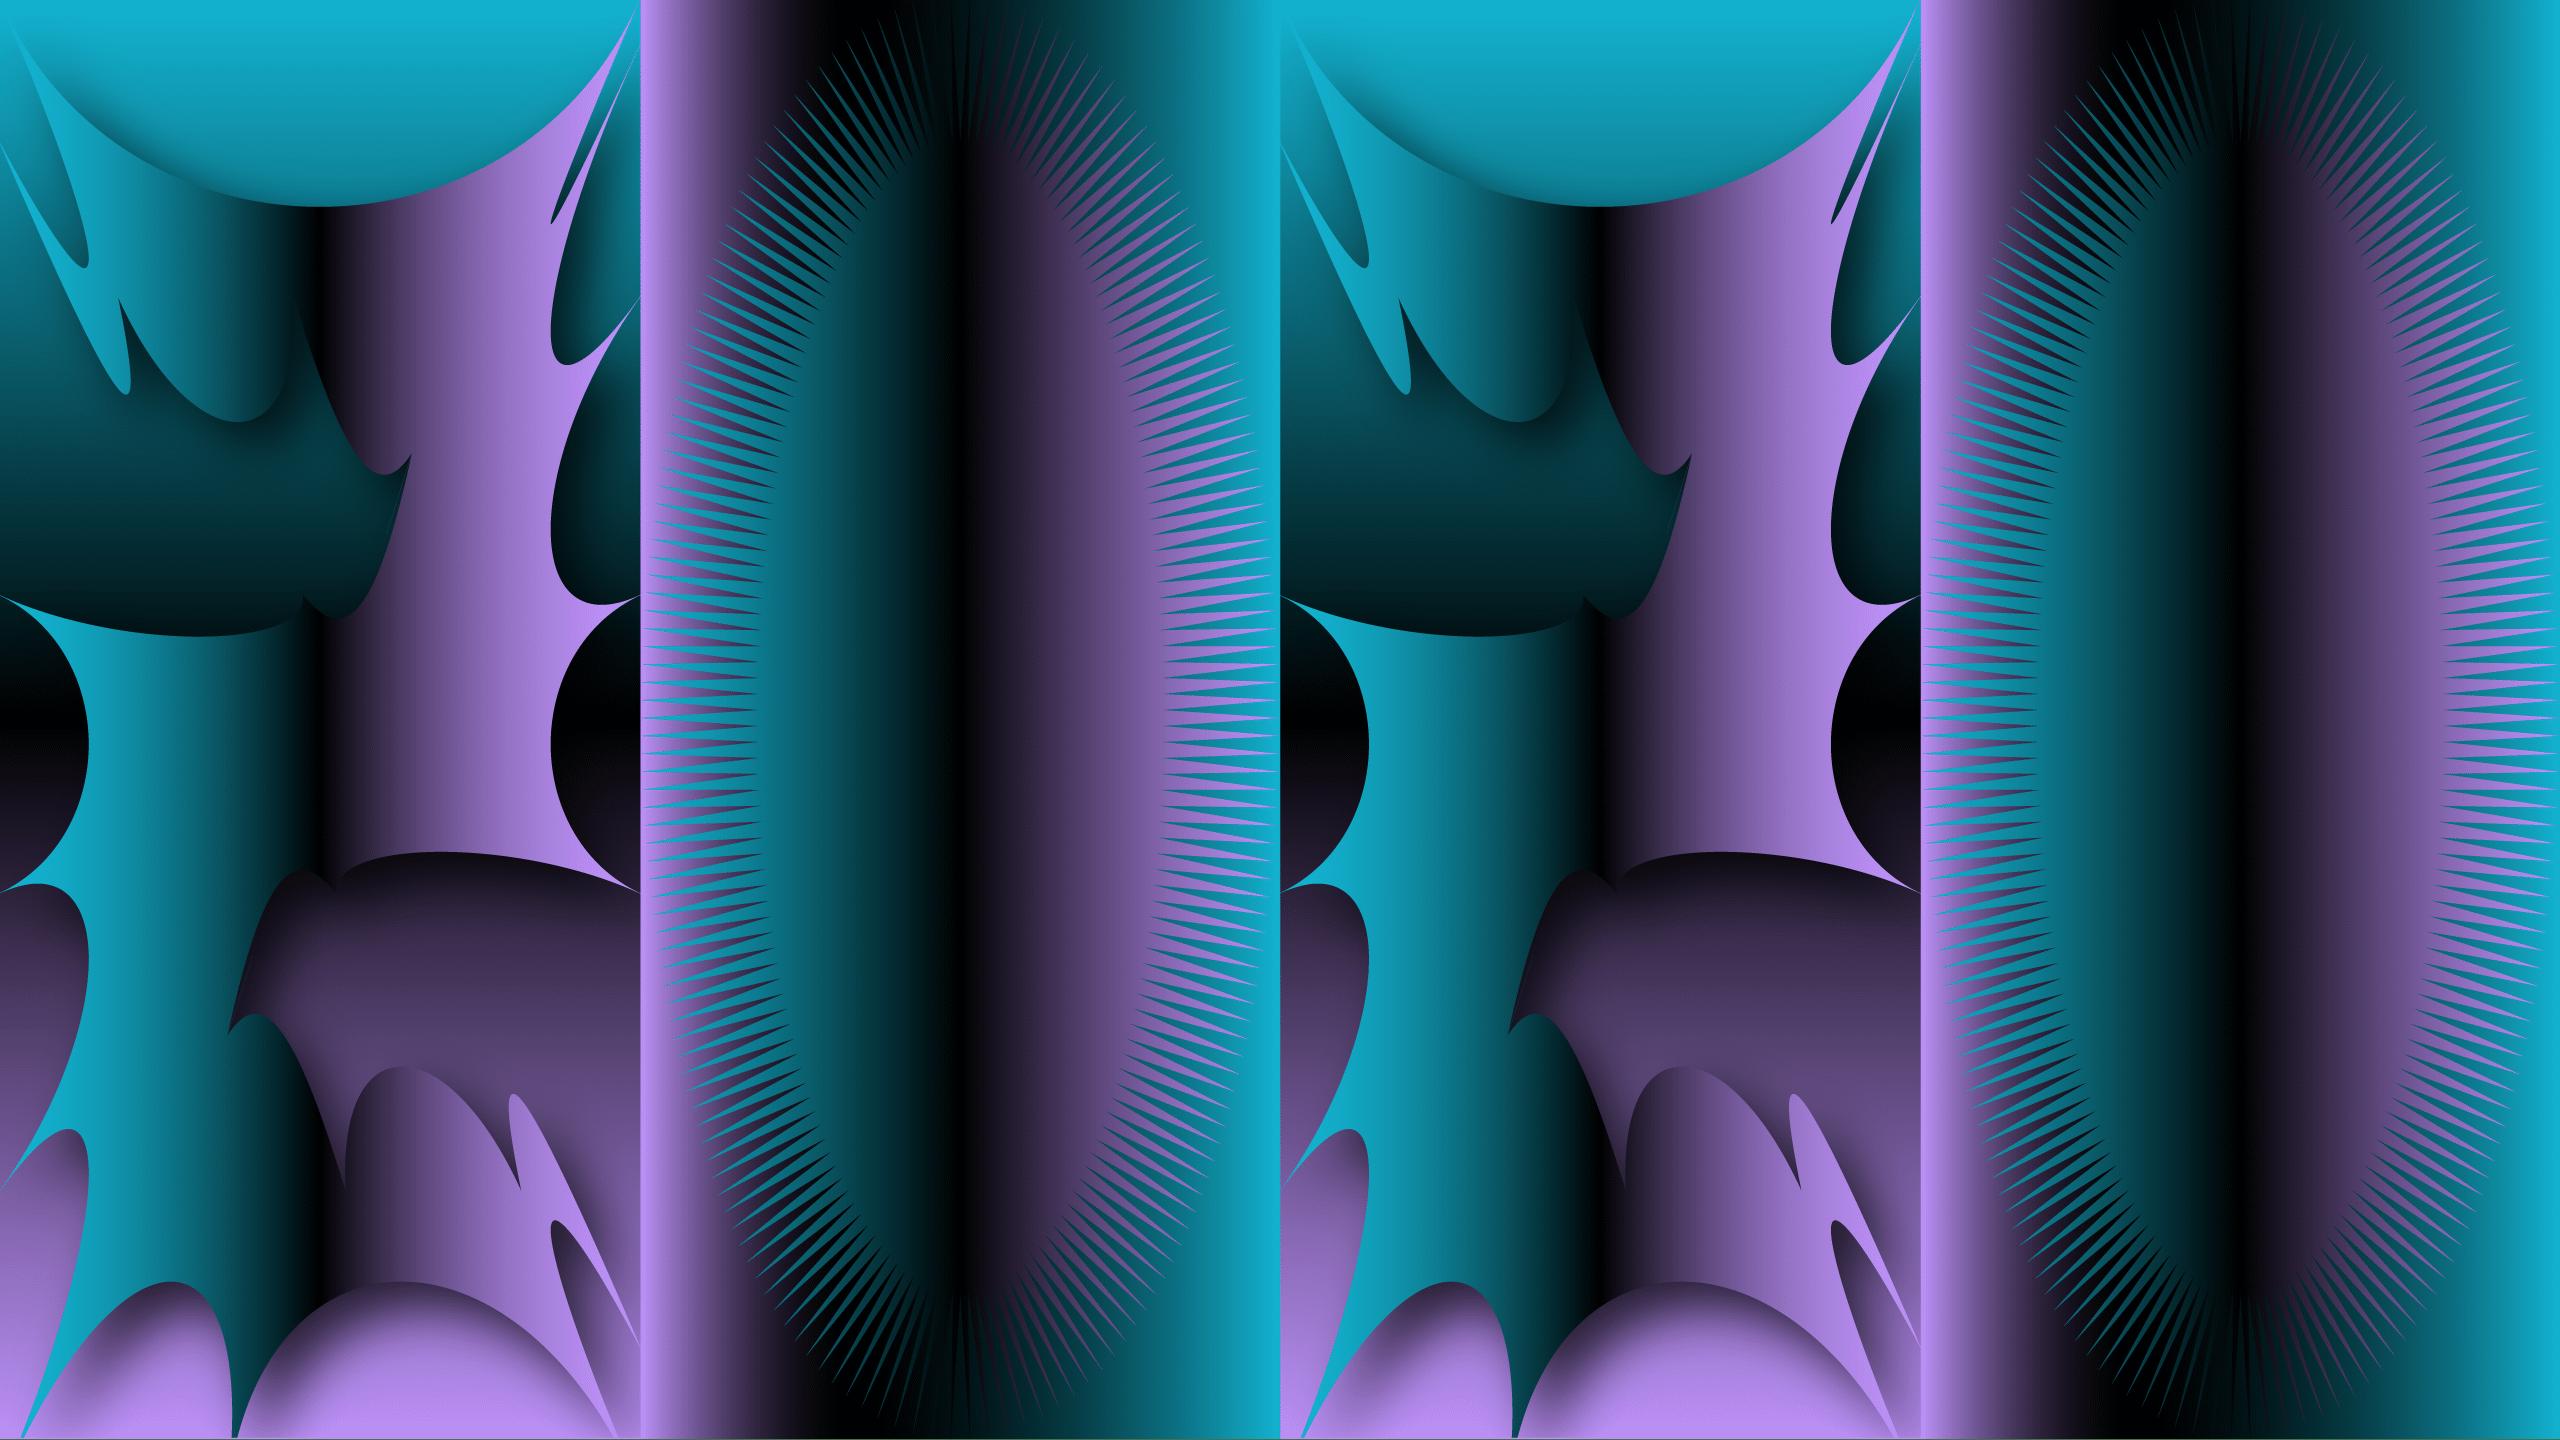 2020_2560x1440